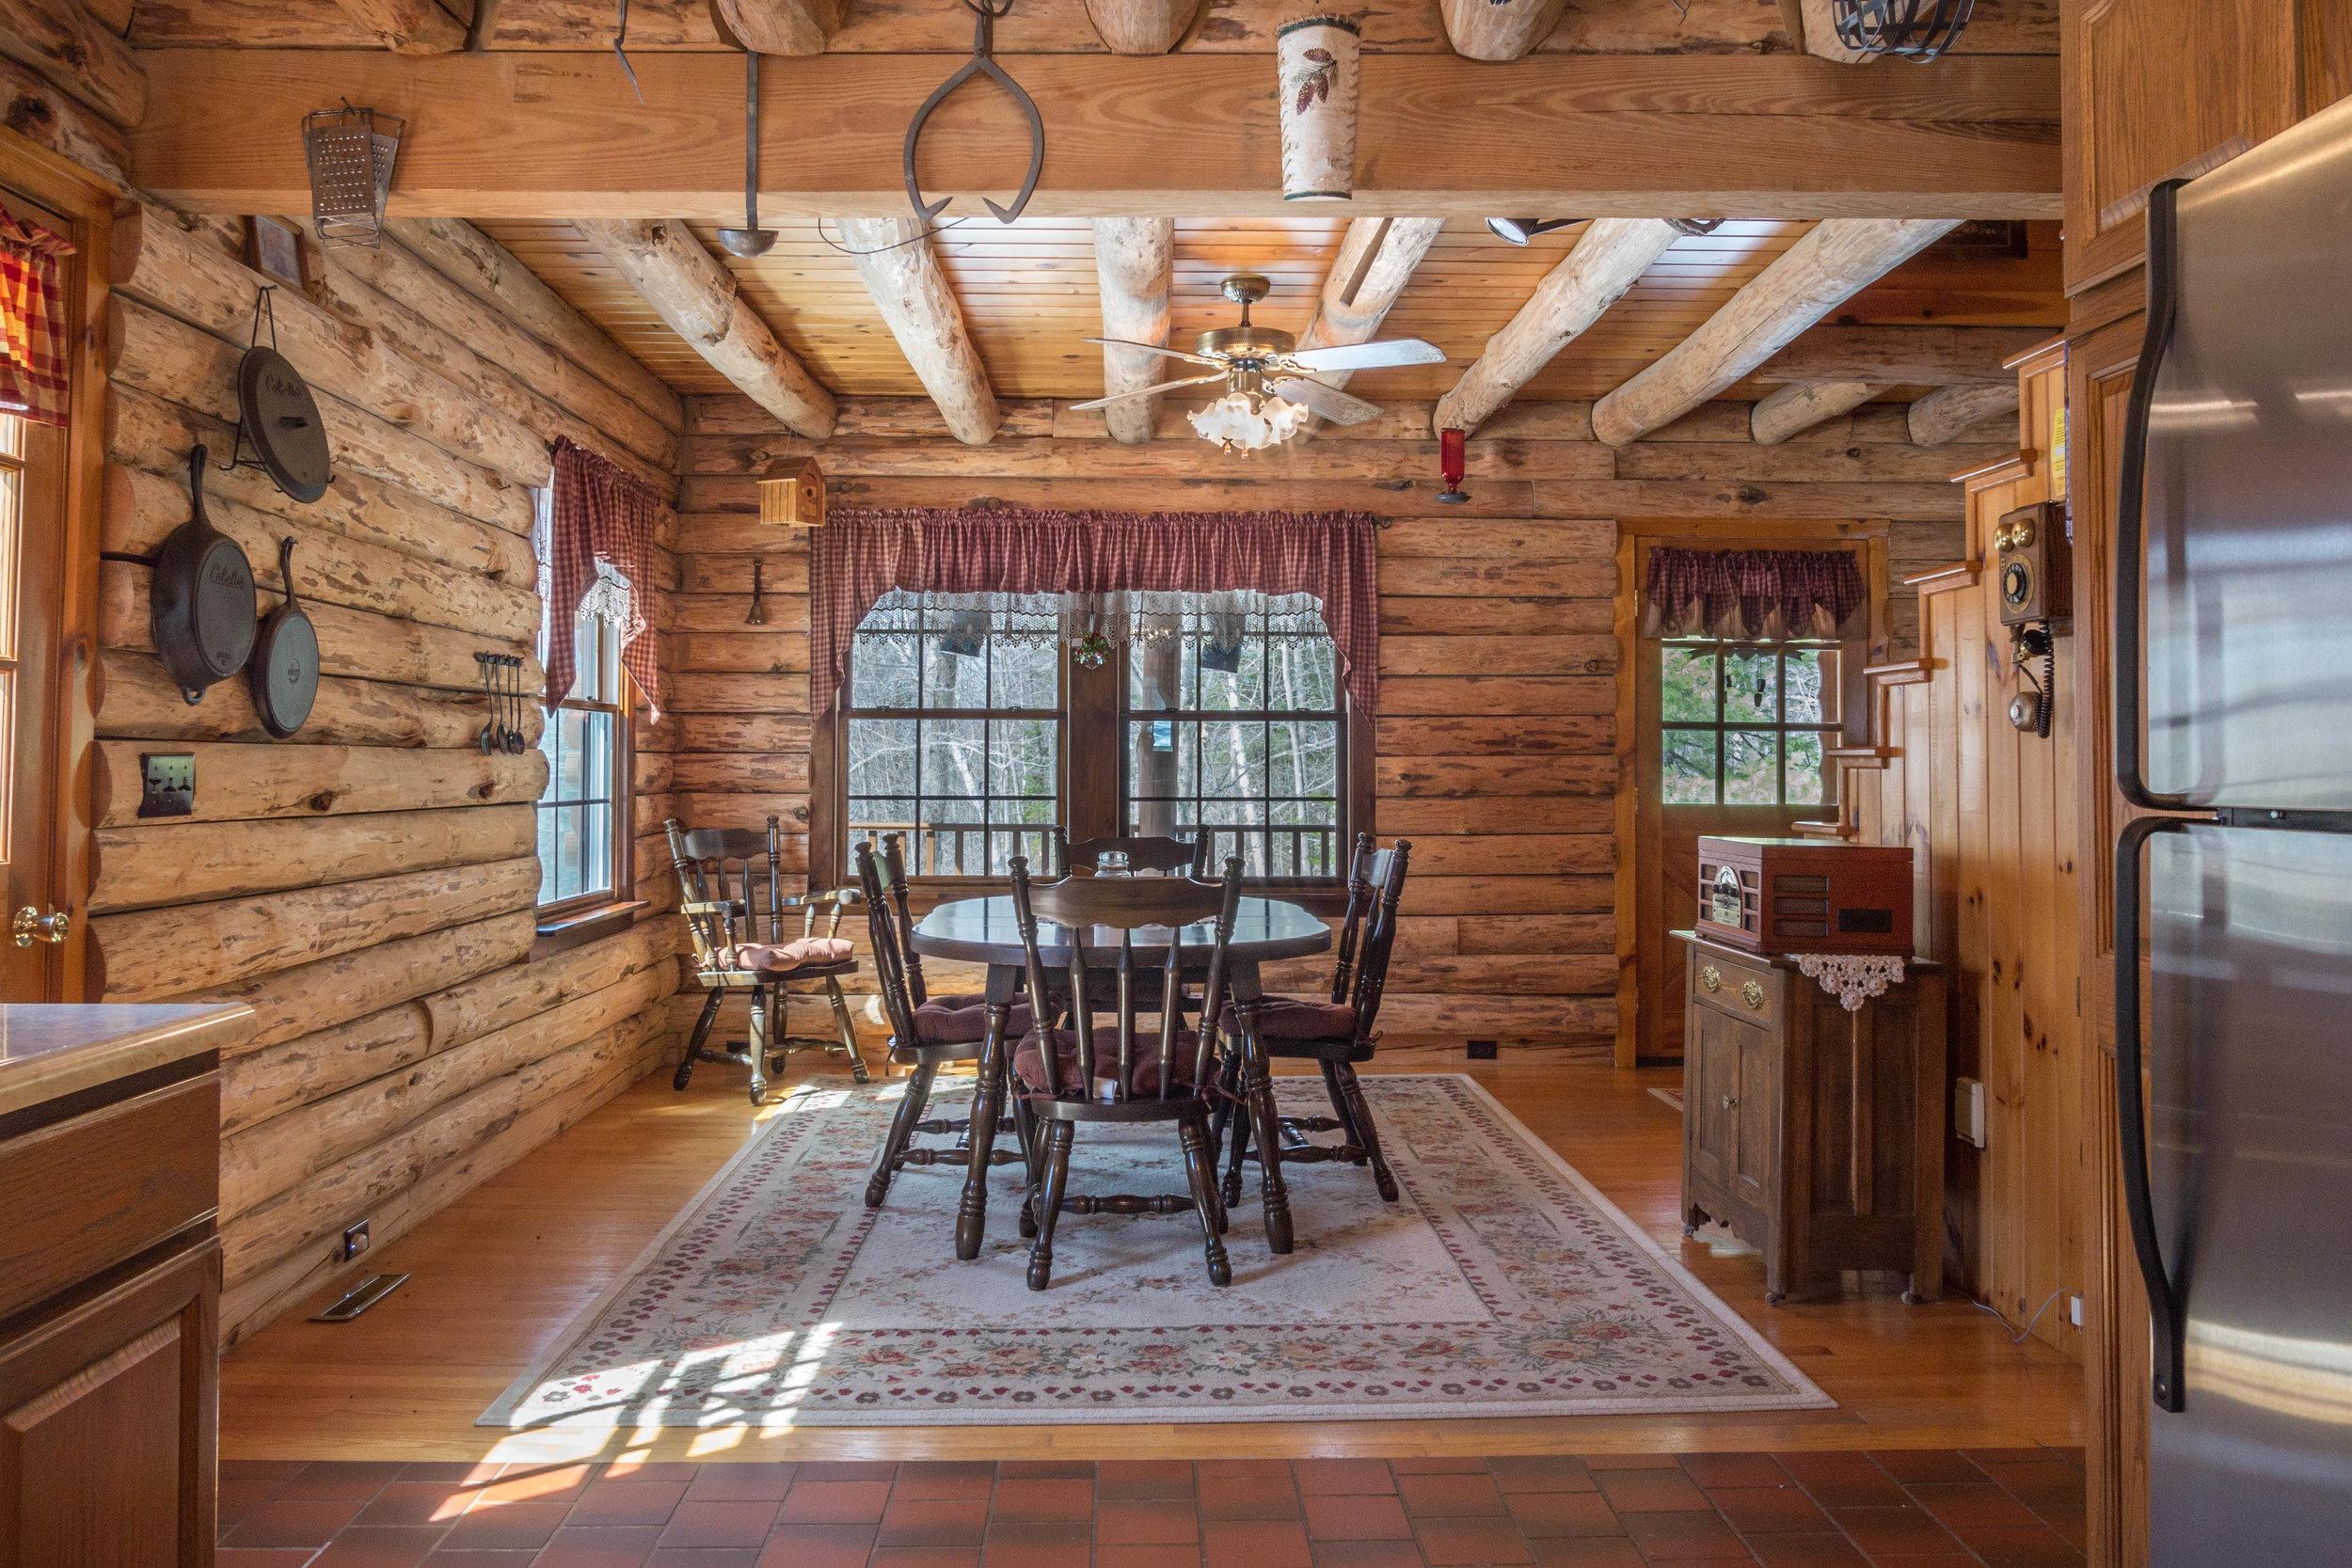 Rustic Cabin Dining Room